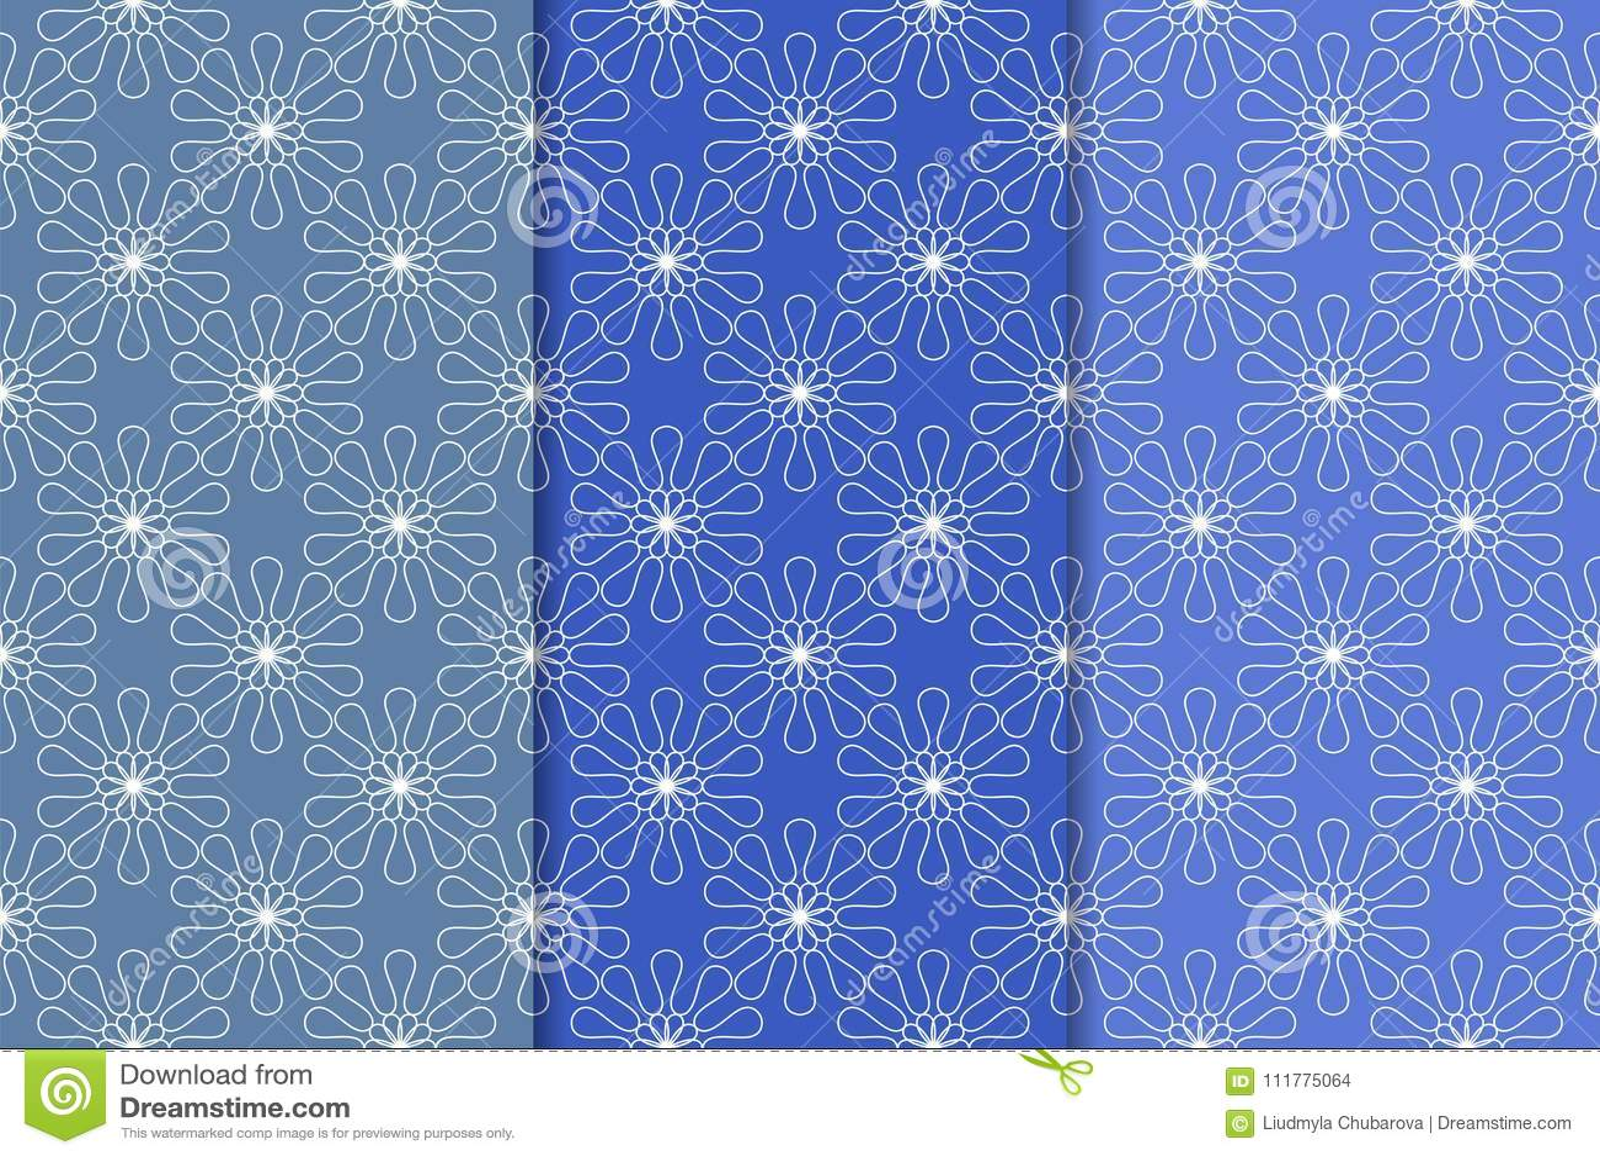 Set of blue floral ornamental designs. Vertical seamless patterns